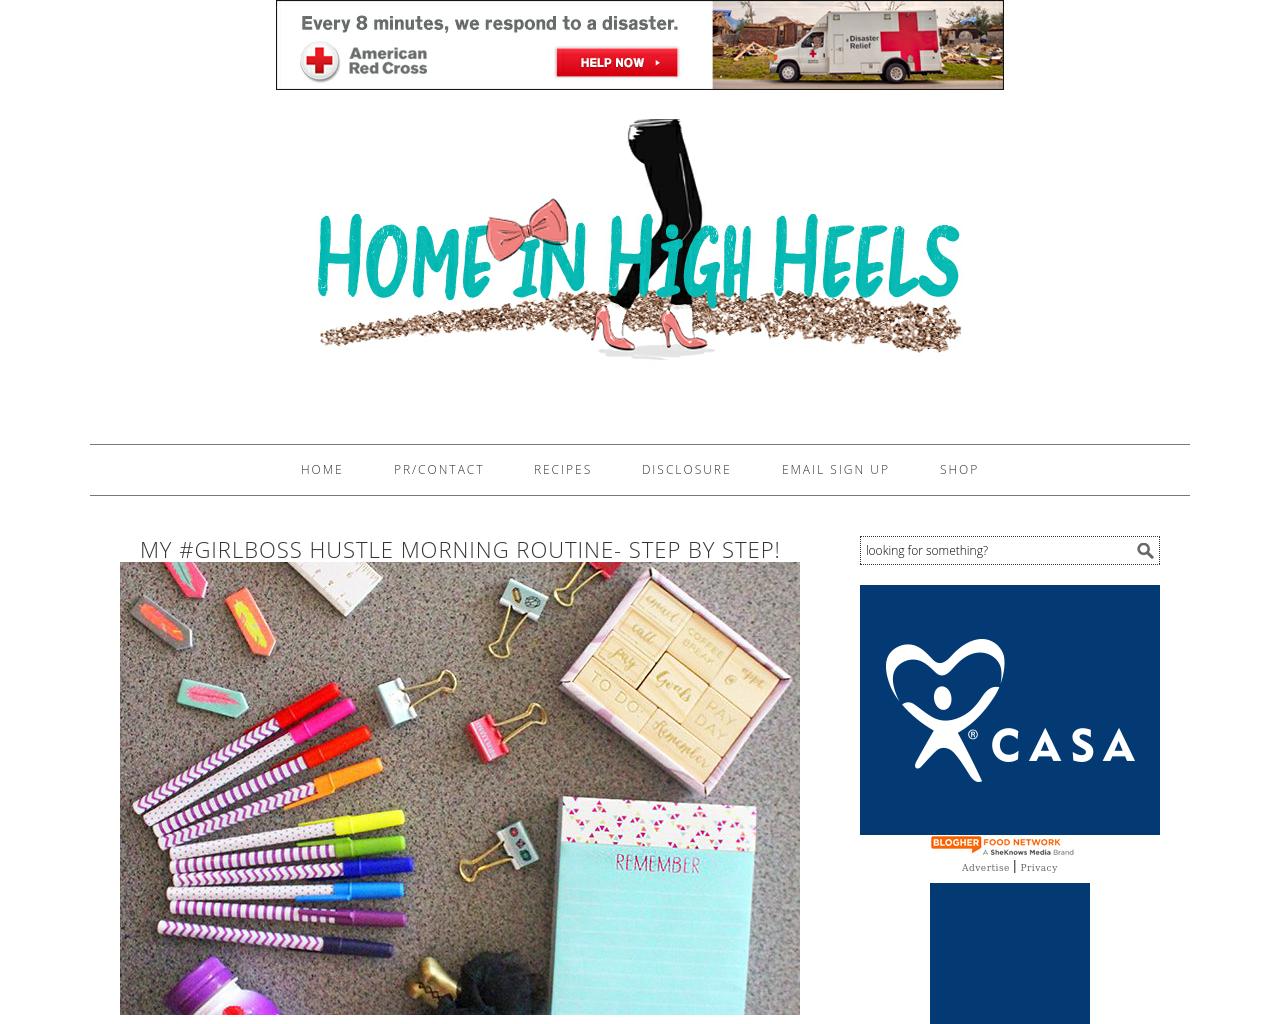 Home-In-High-Heels-Advertising-Reviews-Pricing